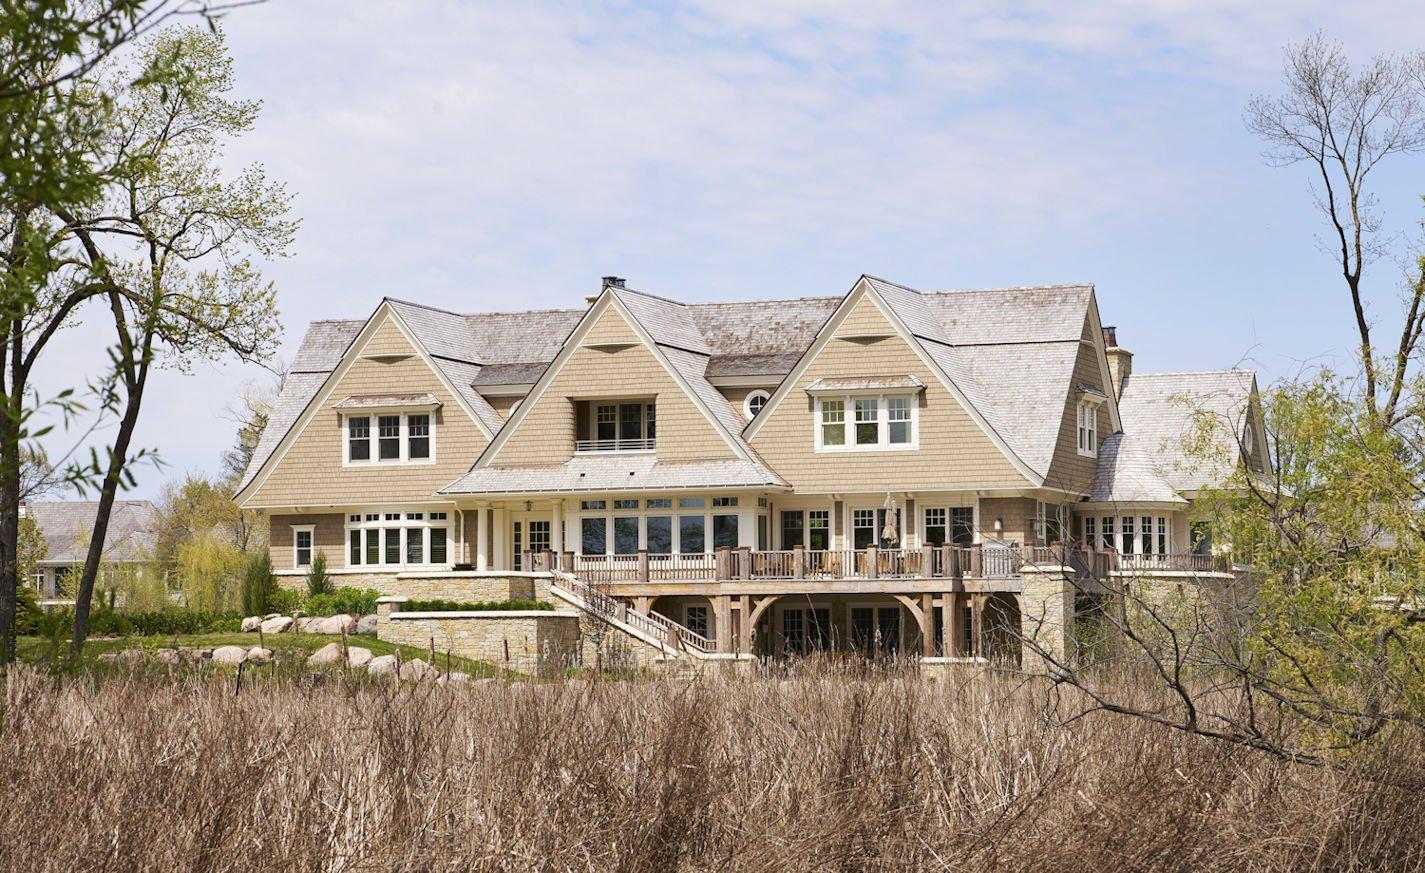 exterior view of Minnetonka Shingle Style home